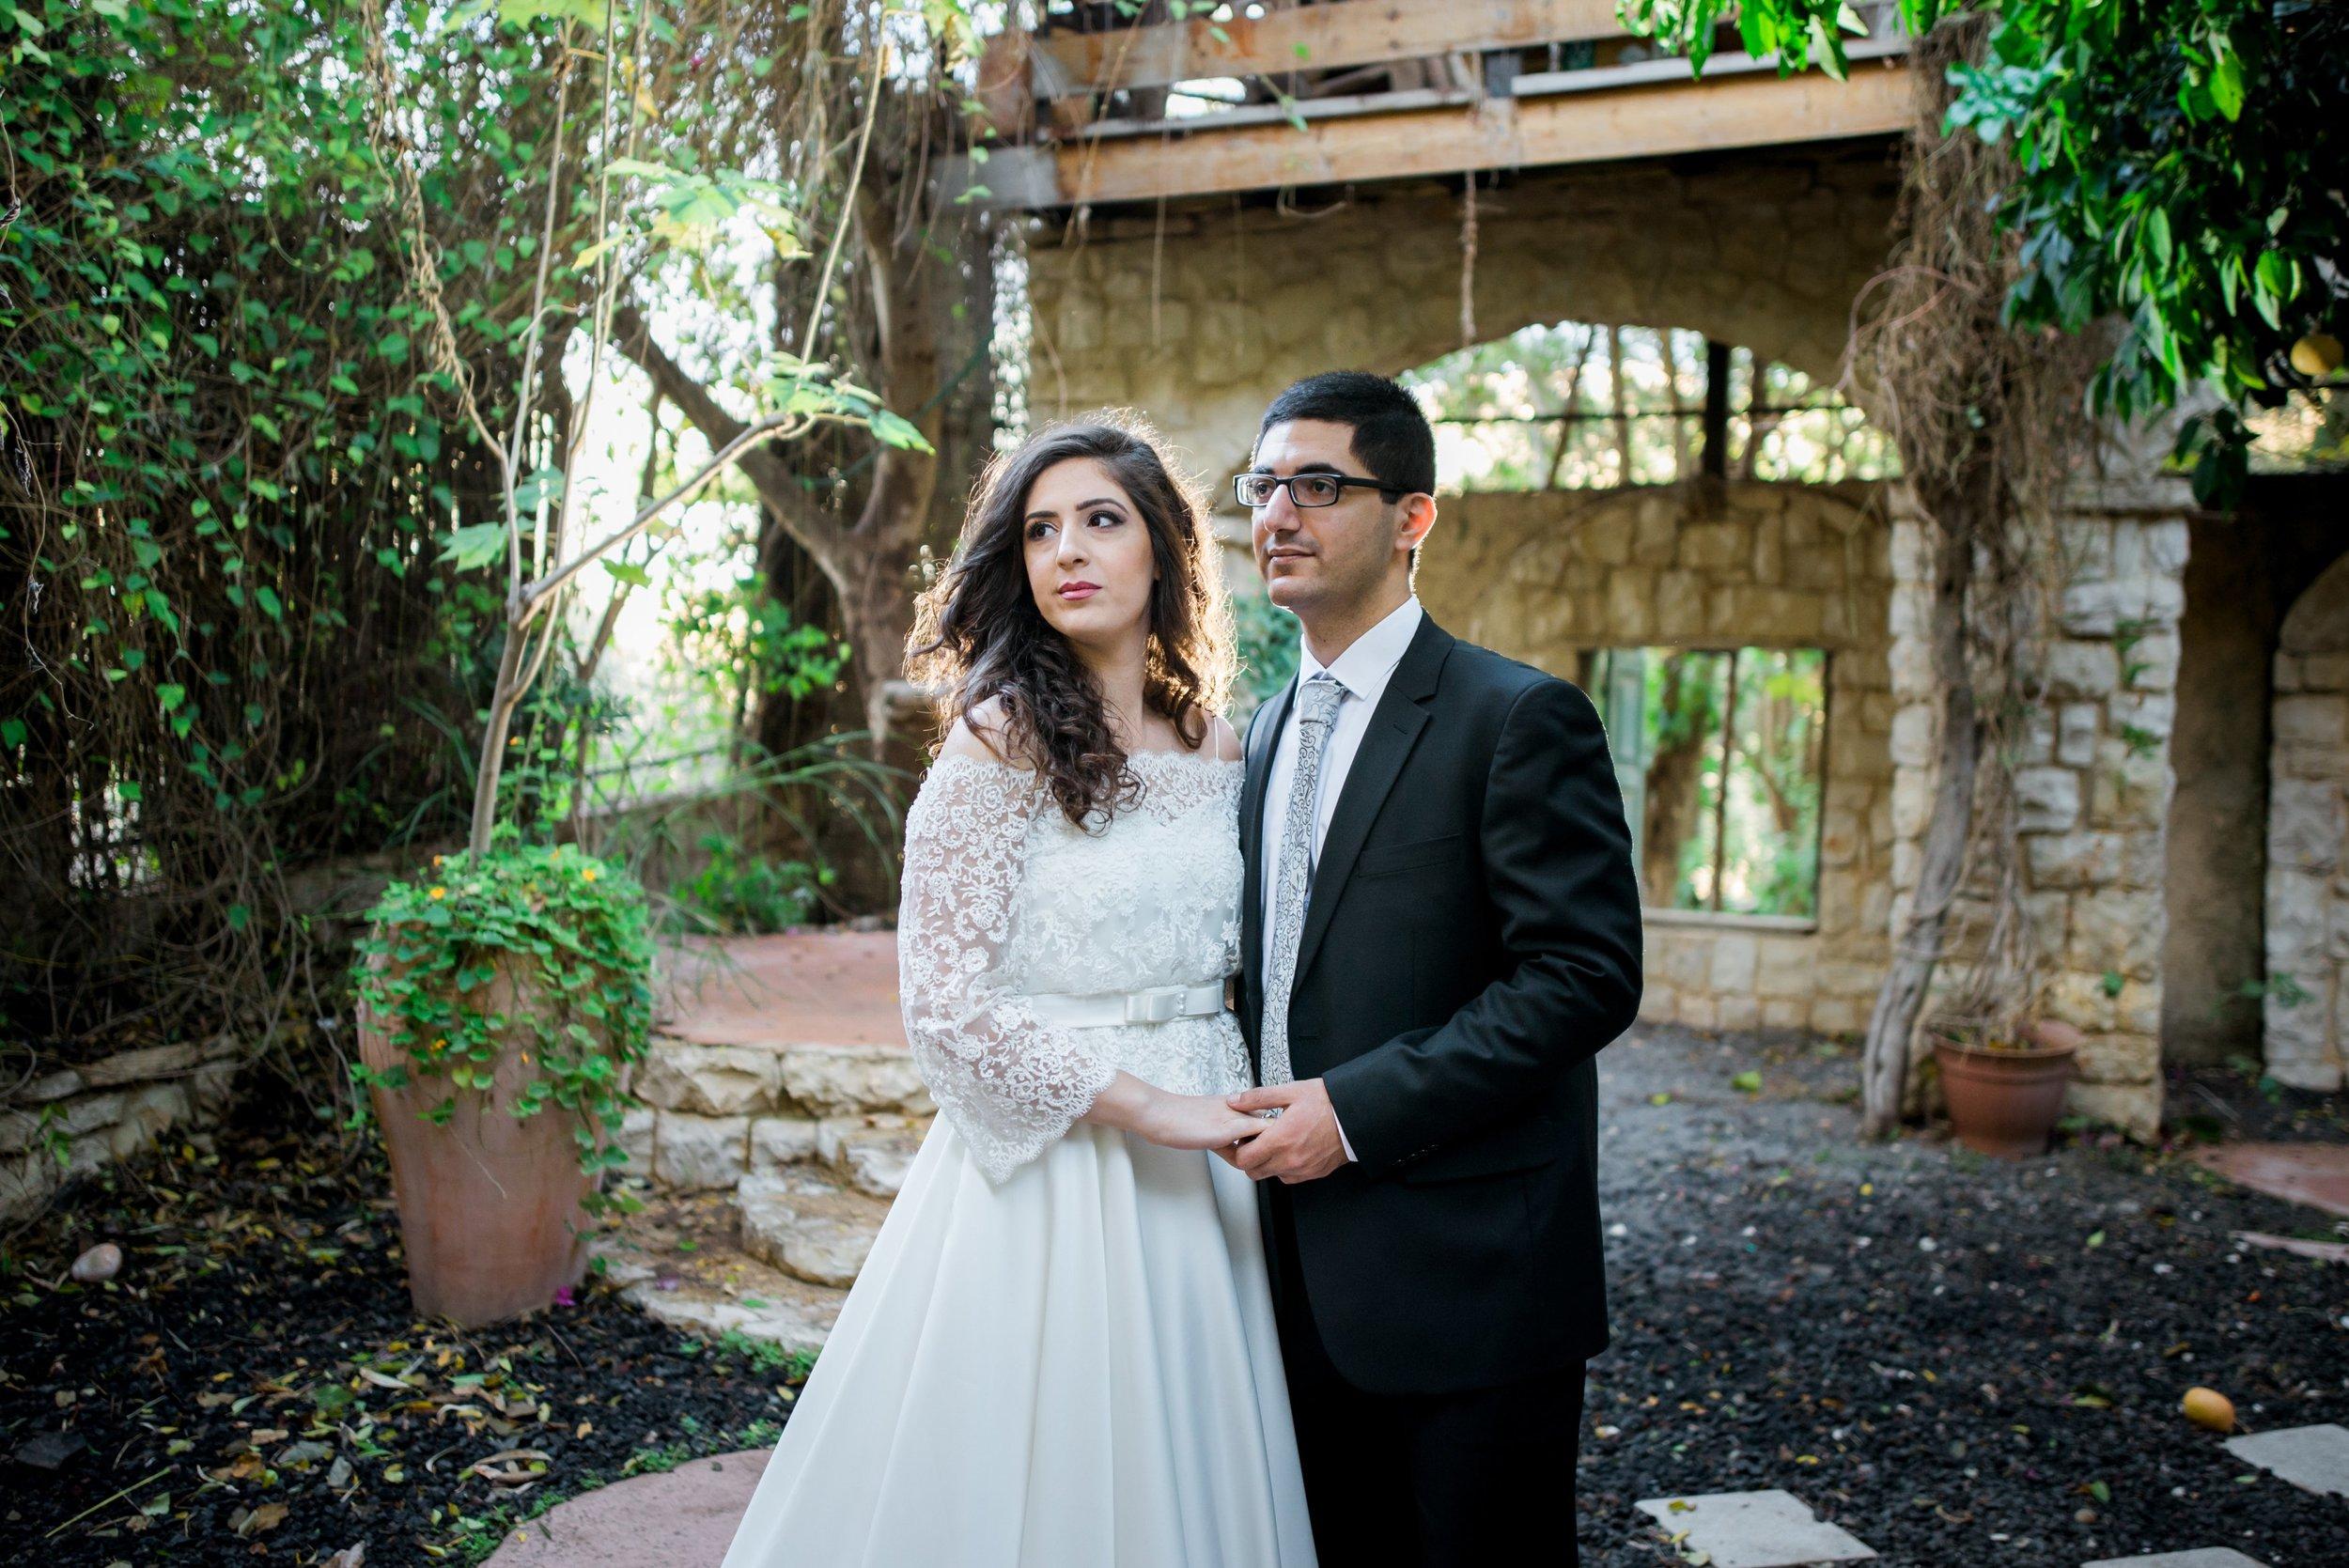 israel-garden-wedding-portraits-session-kate-giryes-photography--3_WEB.jpg